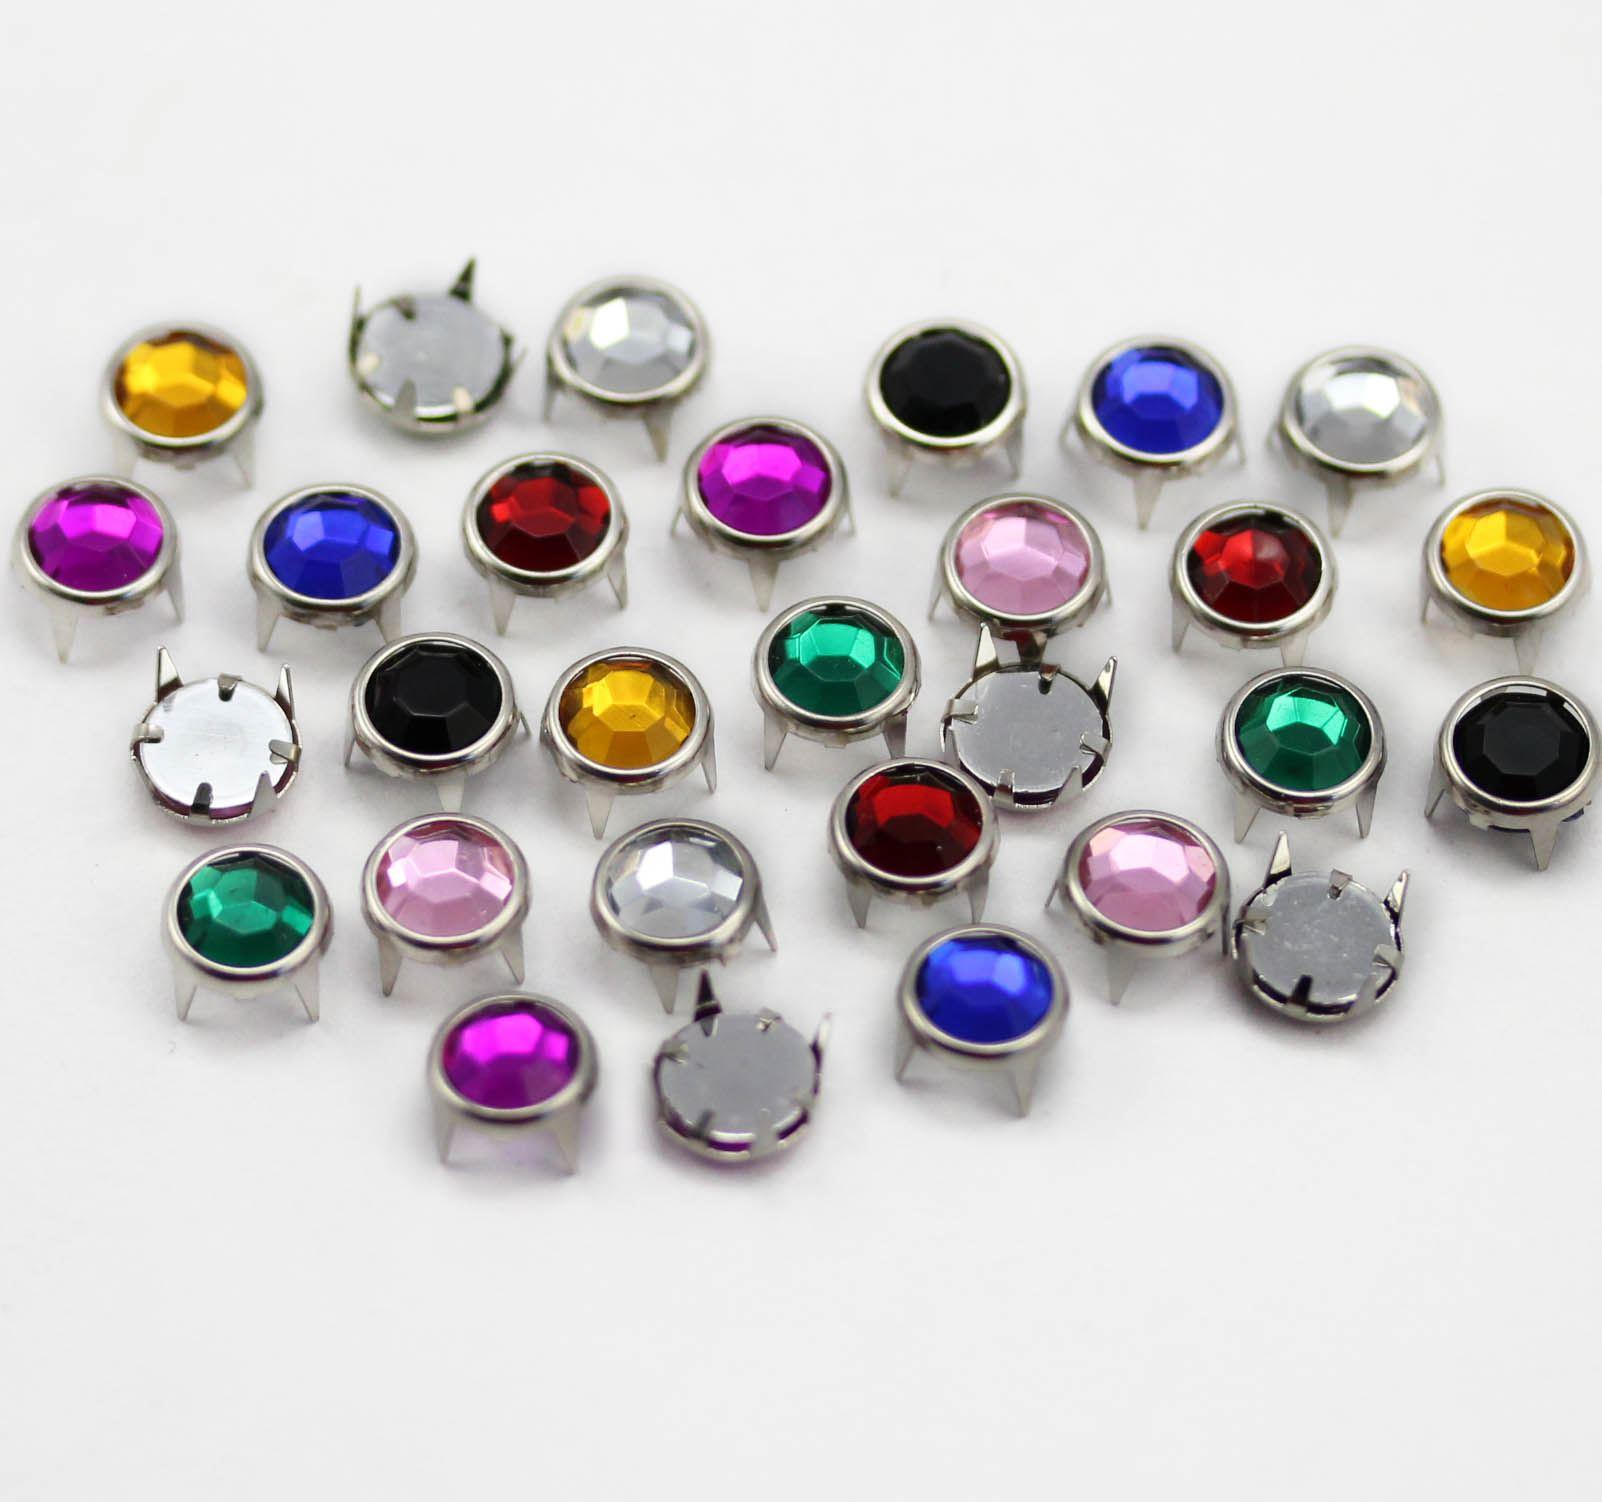 100 Pieces Medium Assorted Colors Bedazzler Rhinestones